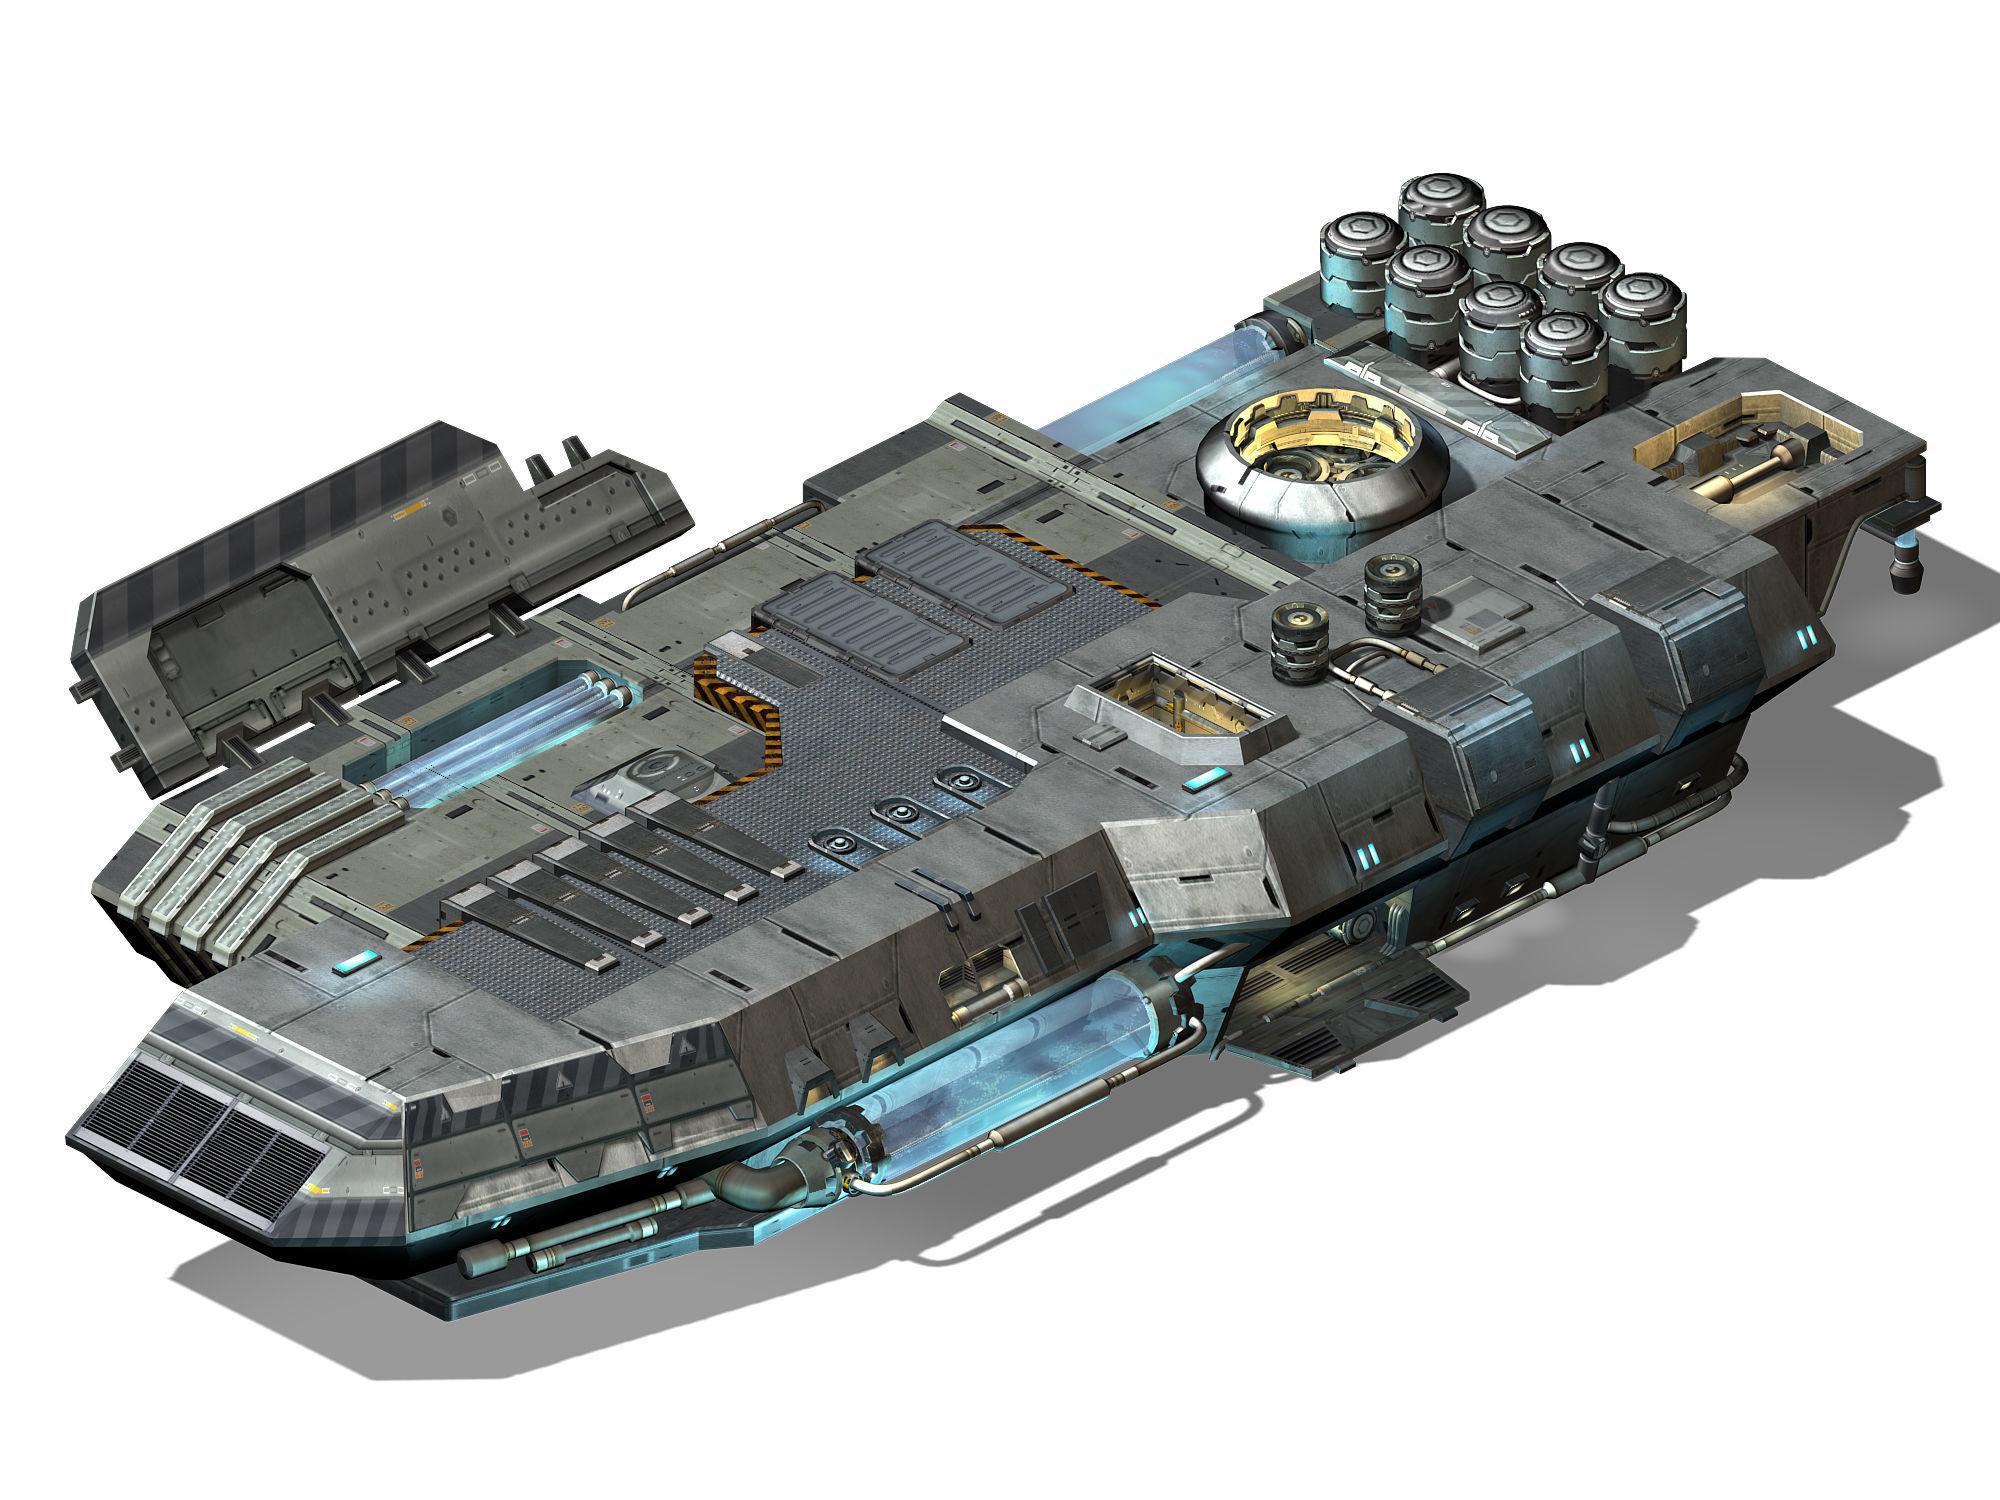 Space Station - Ground Operating Platform 01